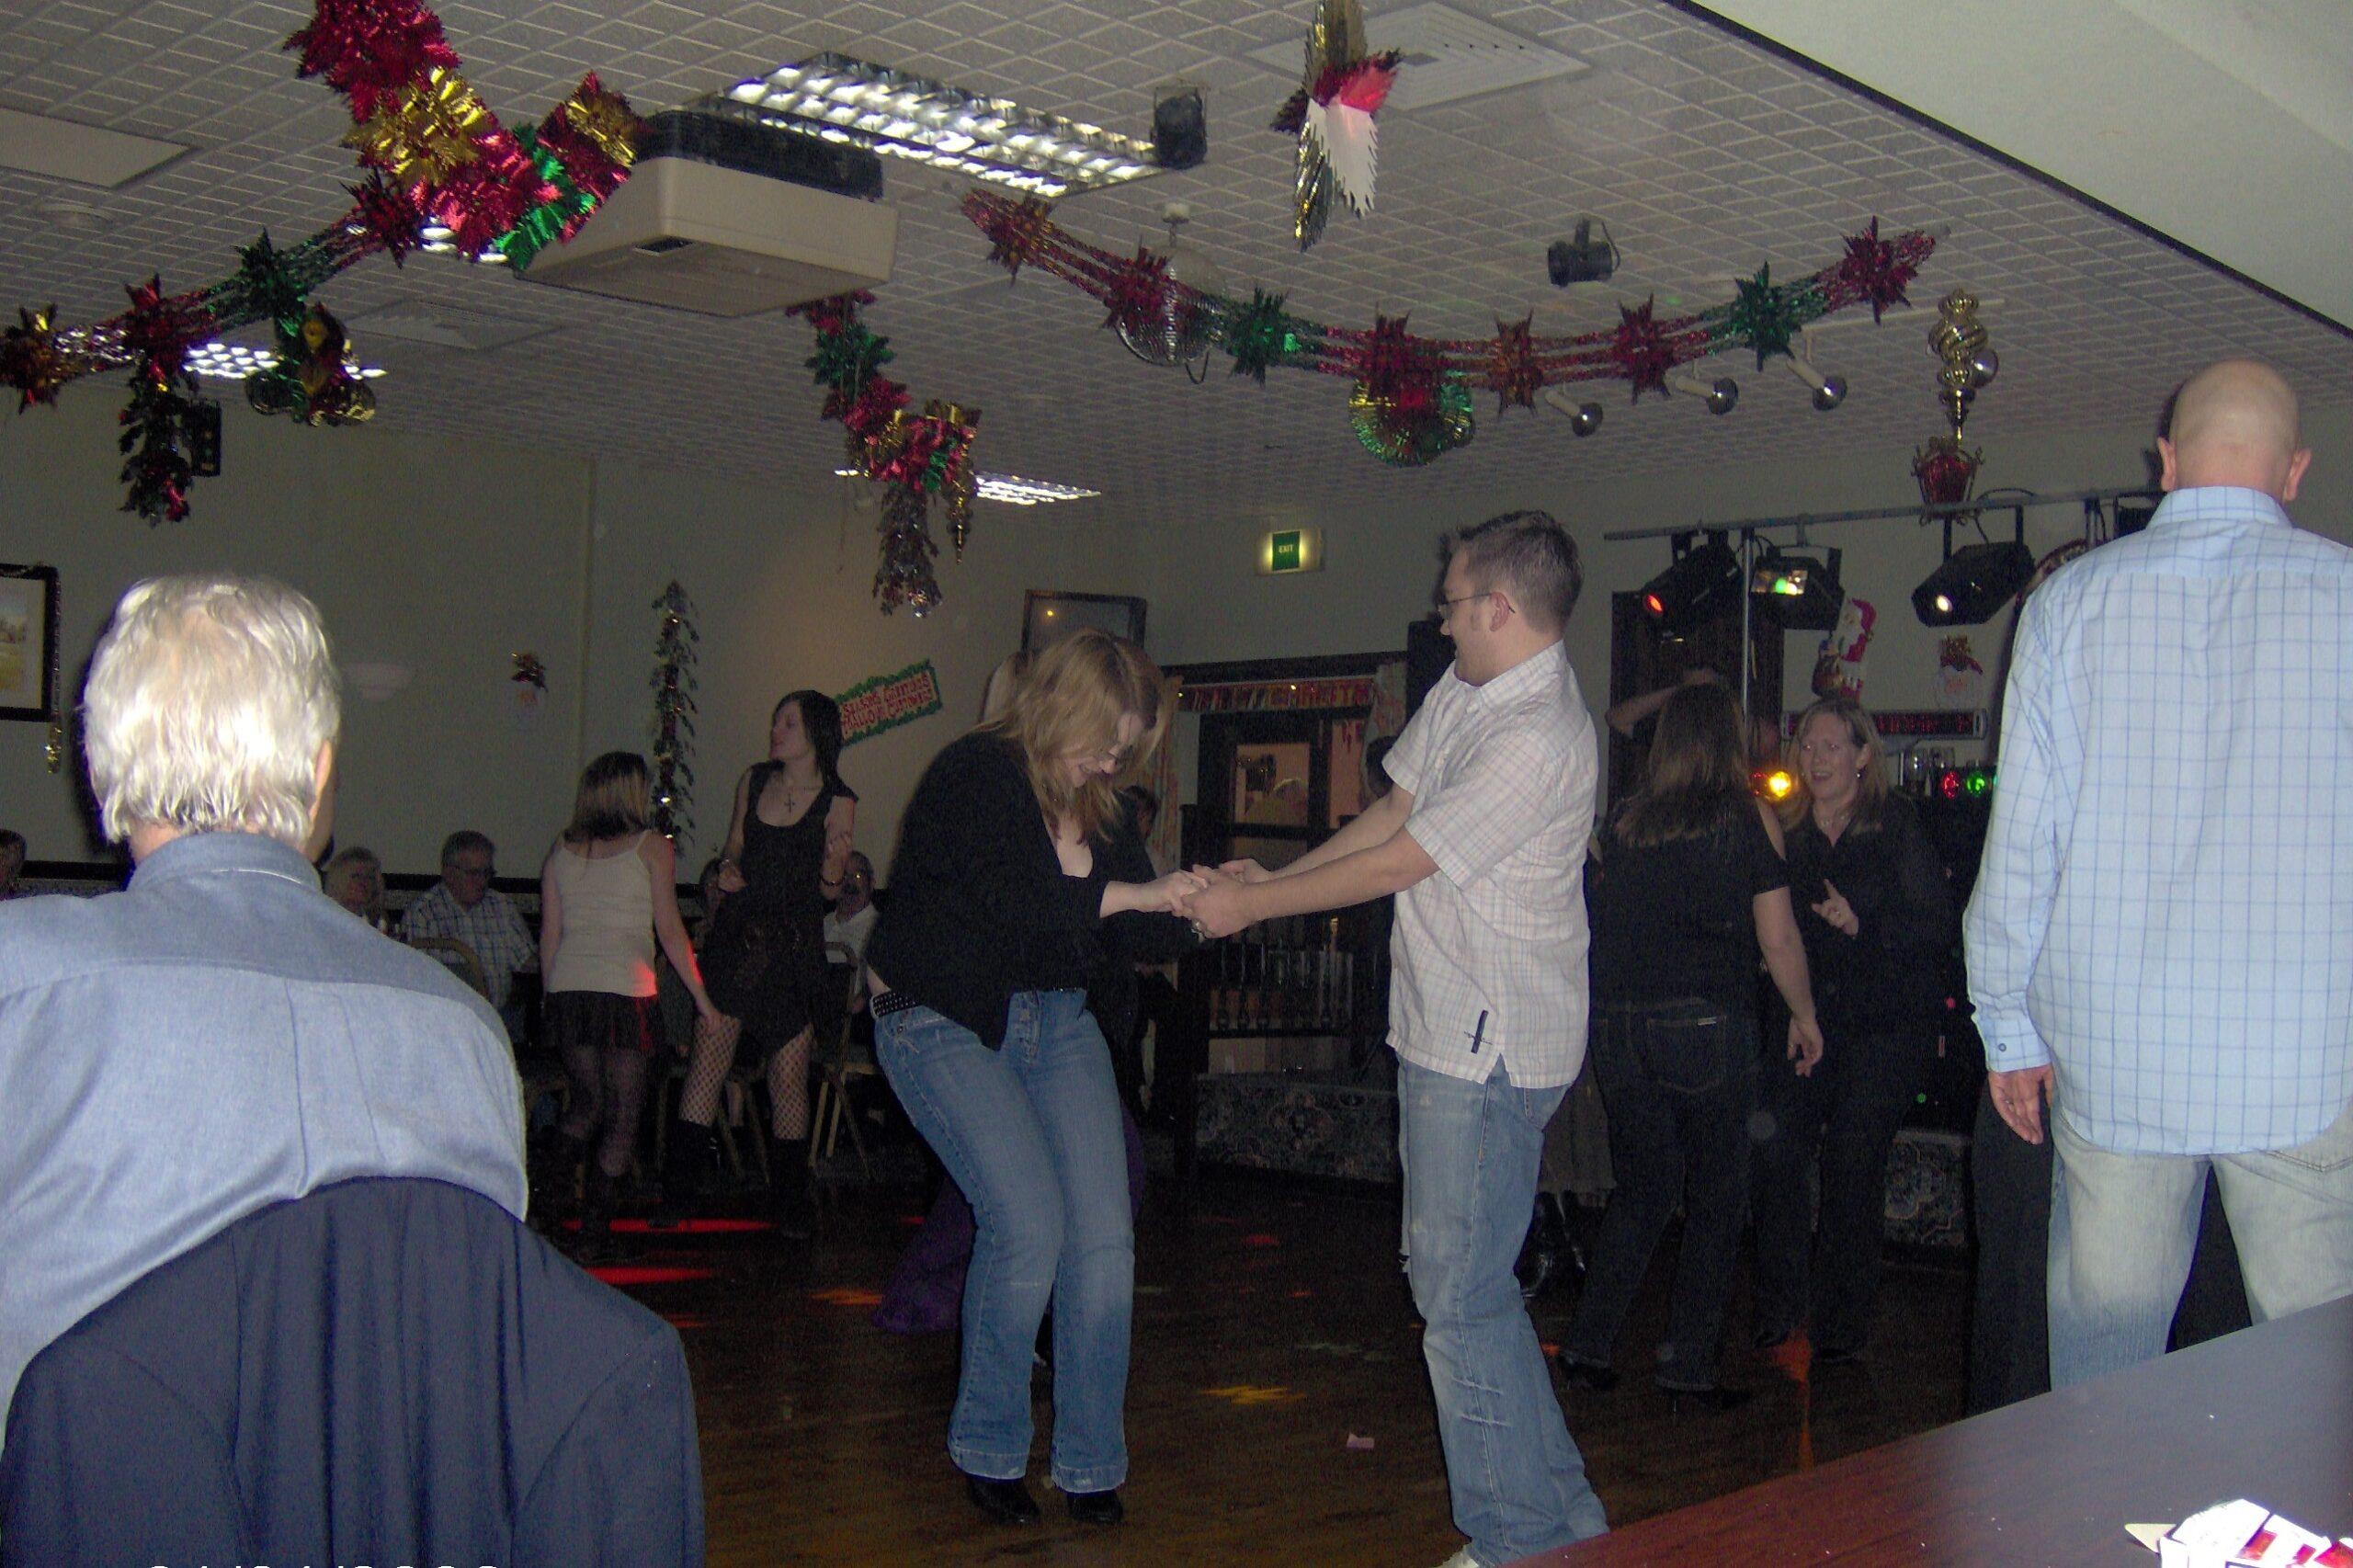 Emma and Tony Dancing